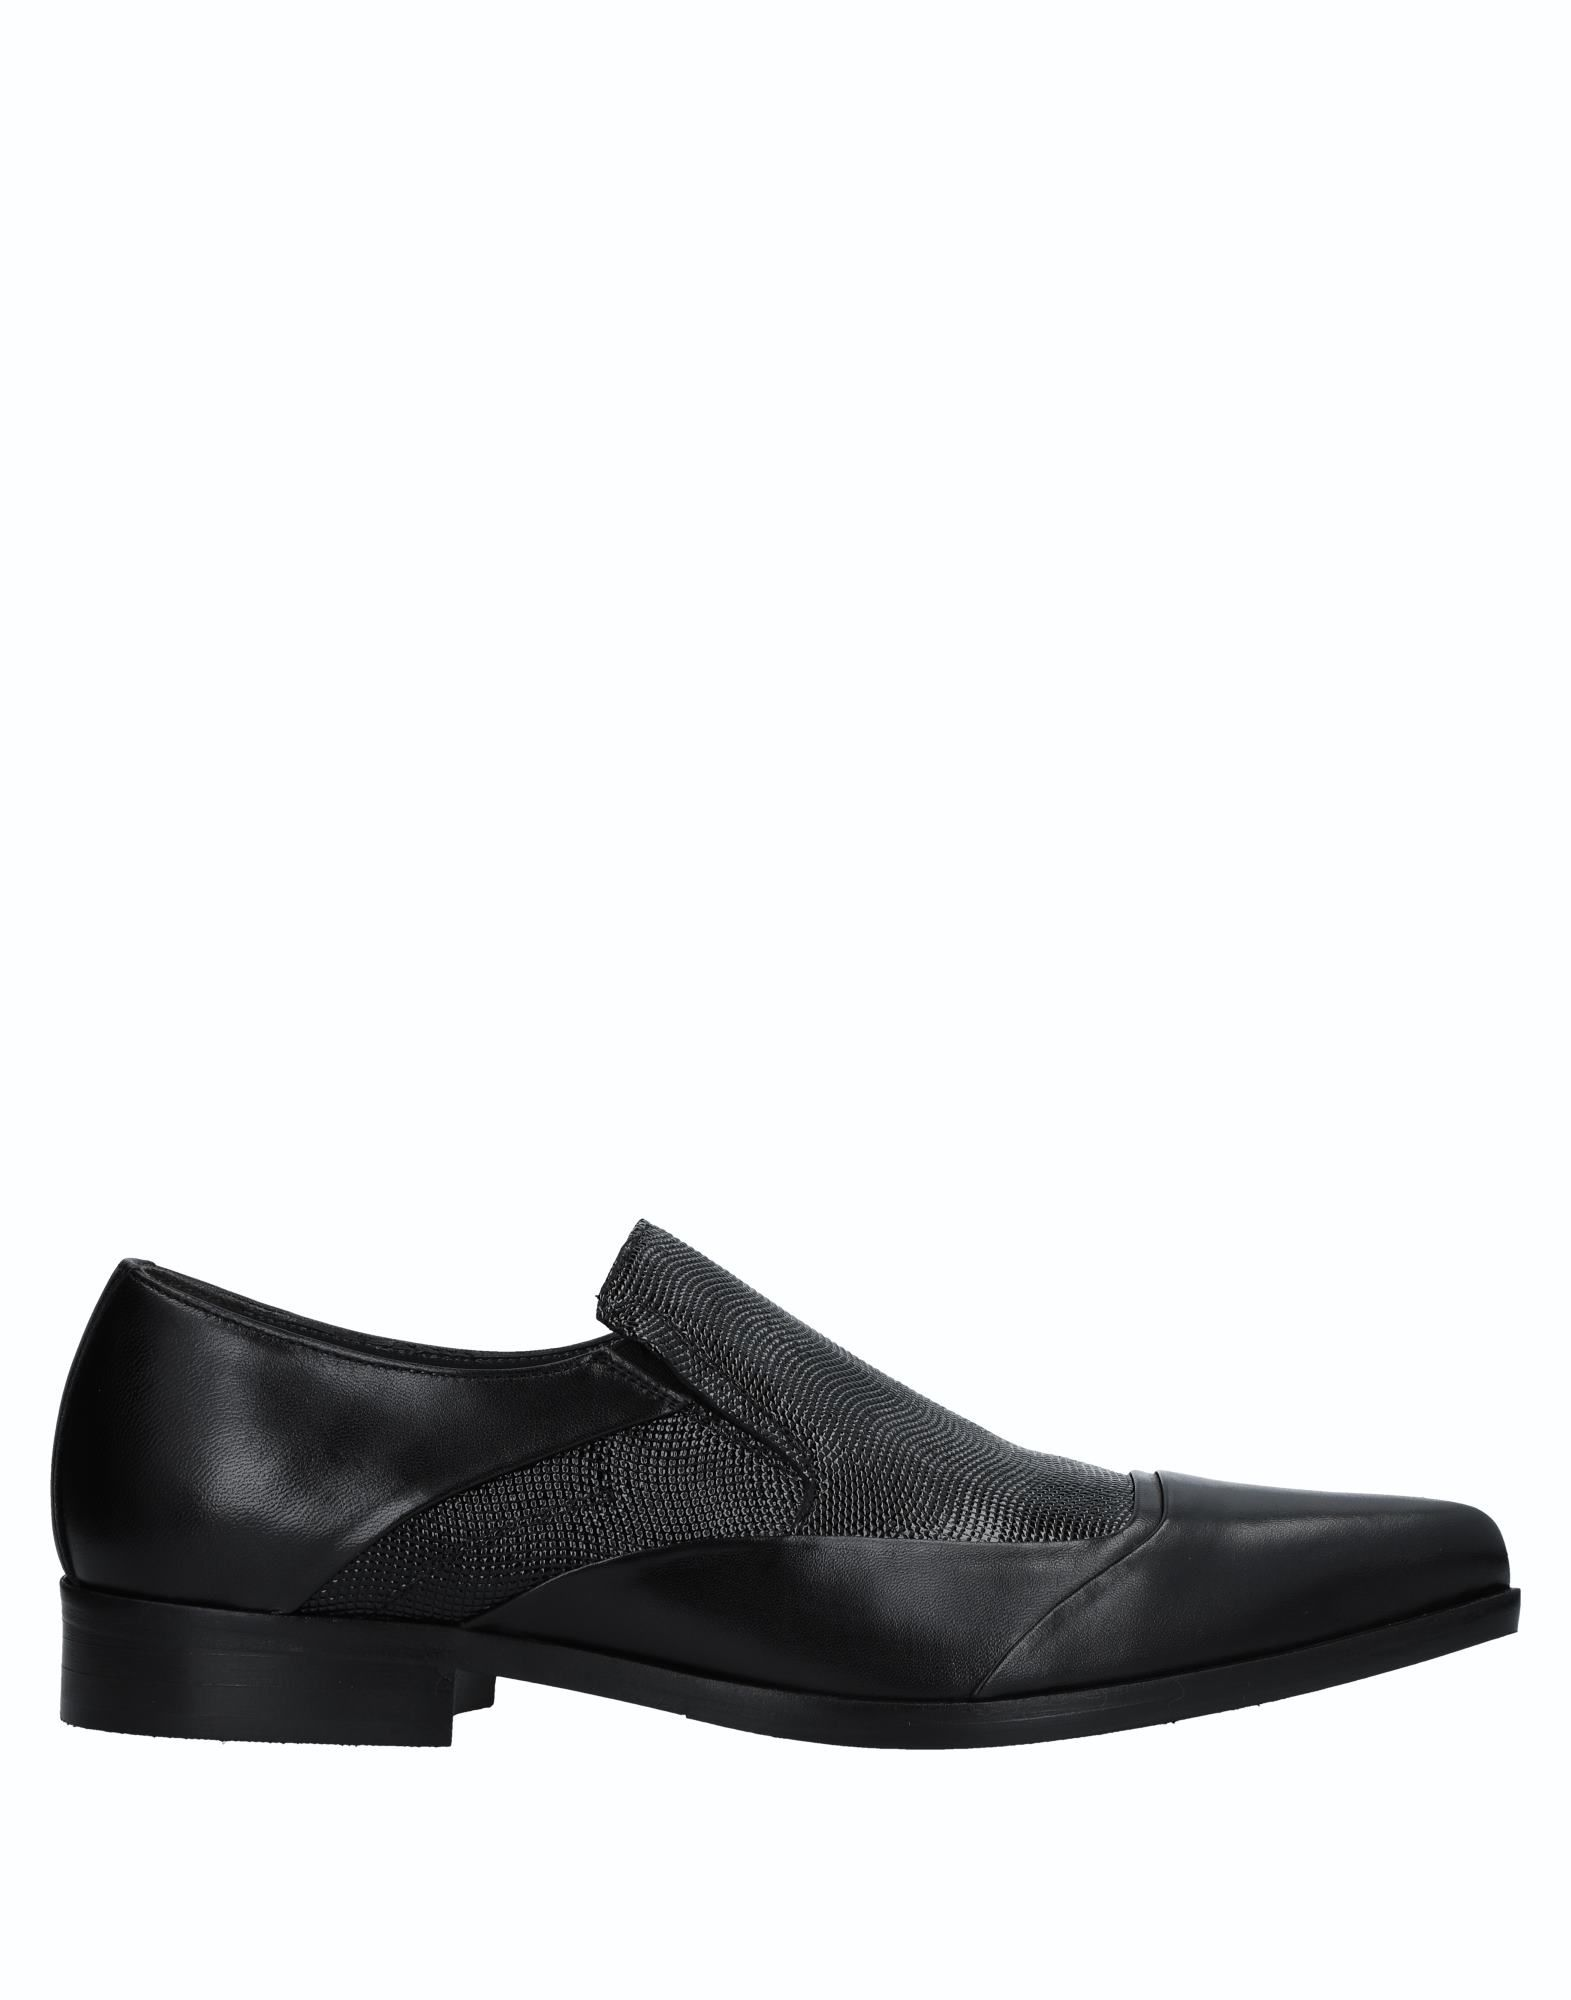 Giovanni Conti Loafers - Men Giovanni Conti Loafers Loafers Loafers online on  United Kingdom - 11519390QL 3258e6